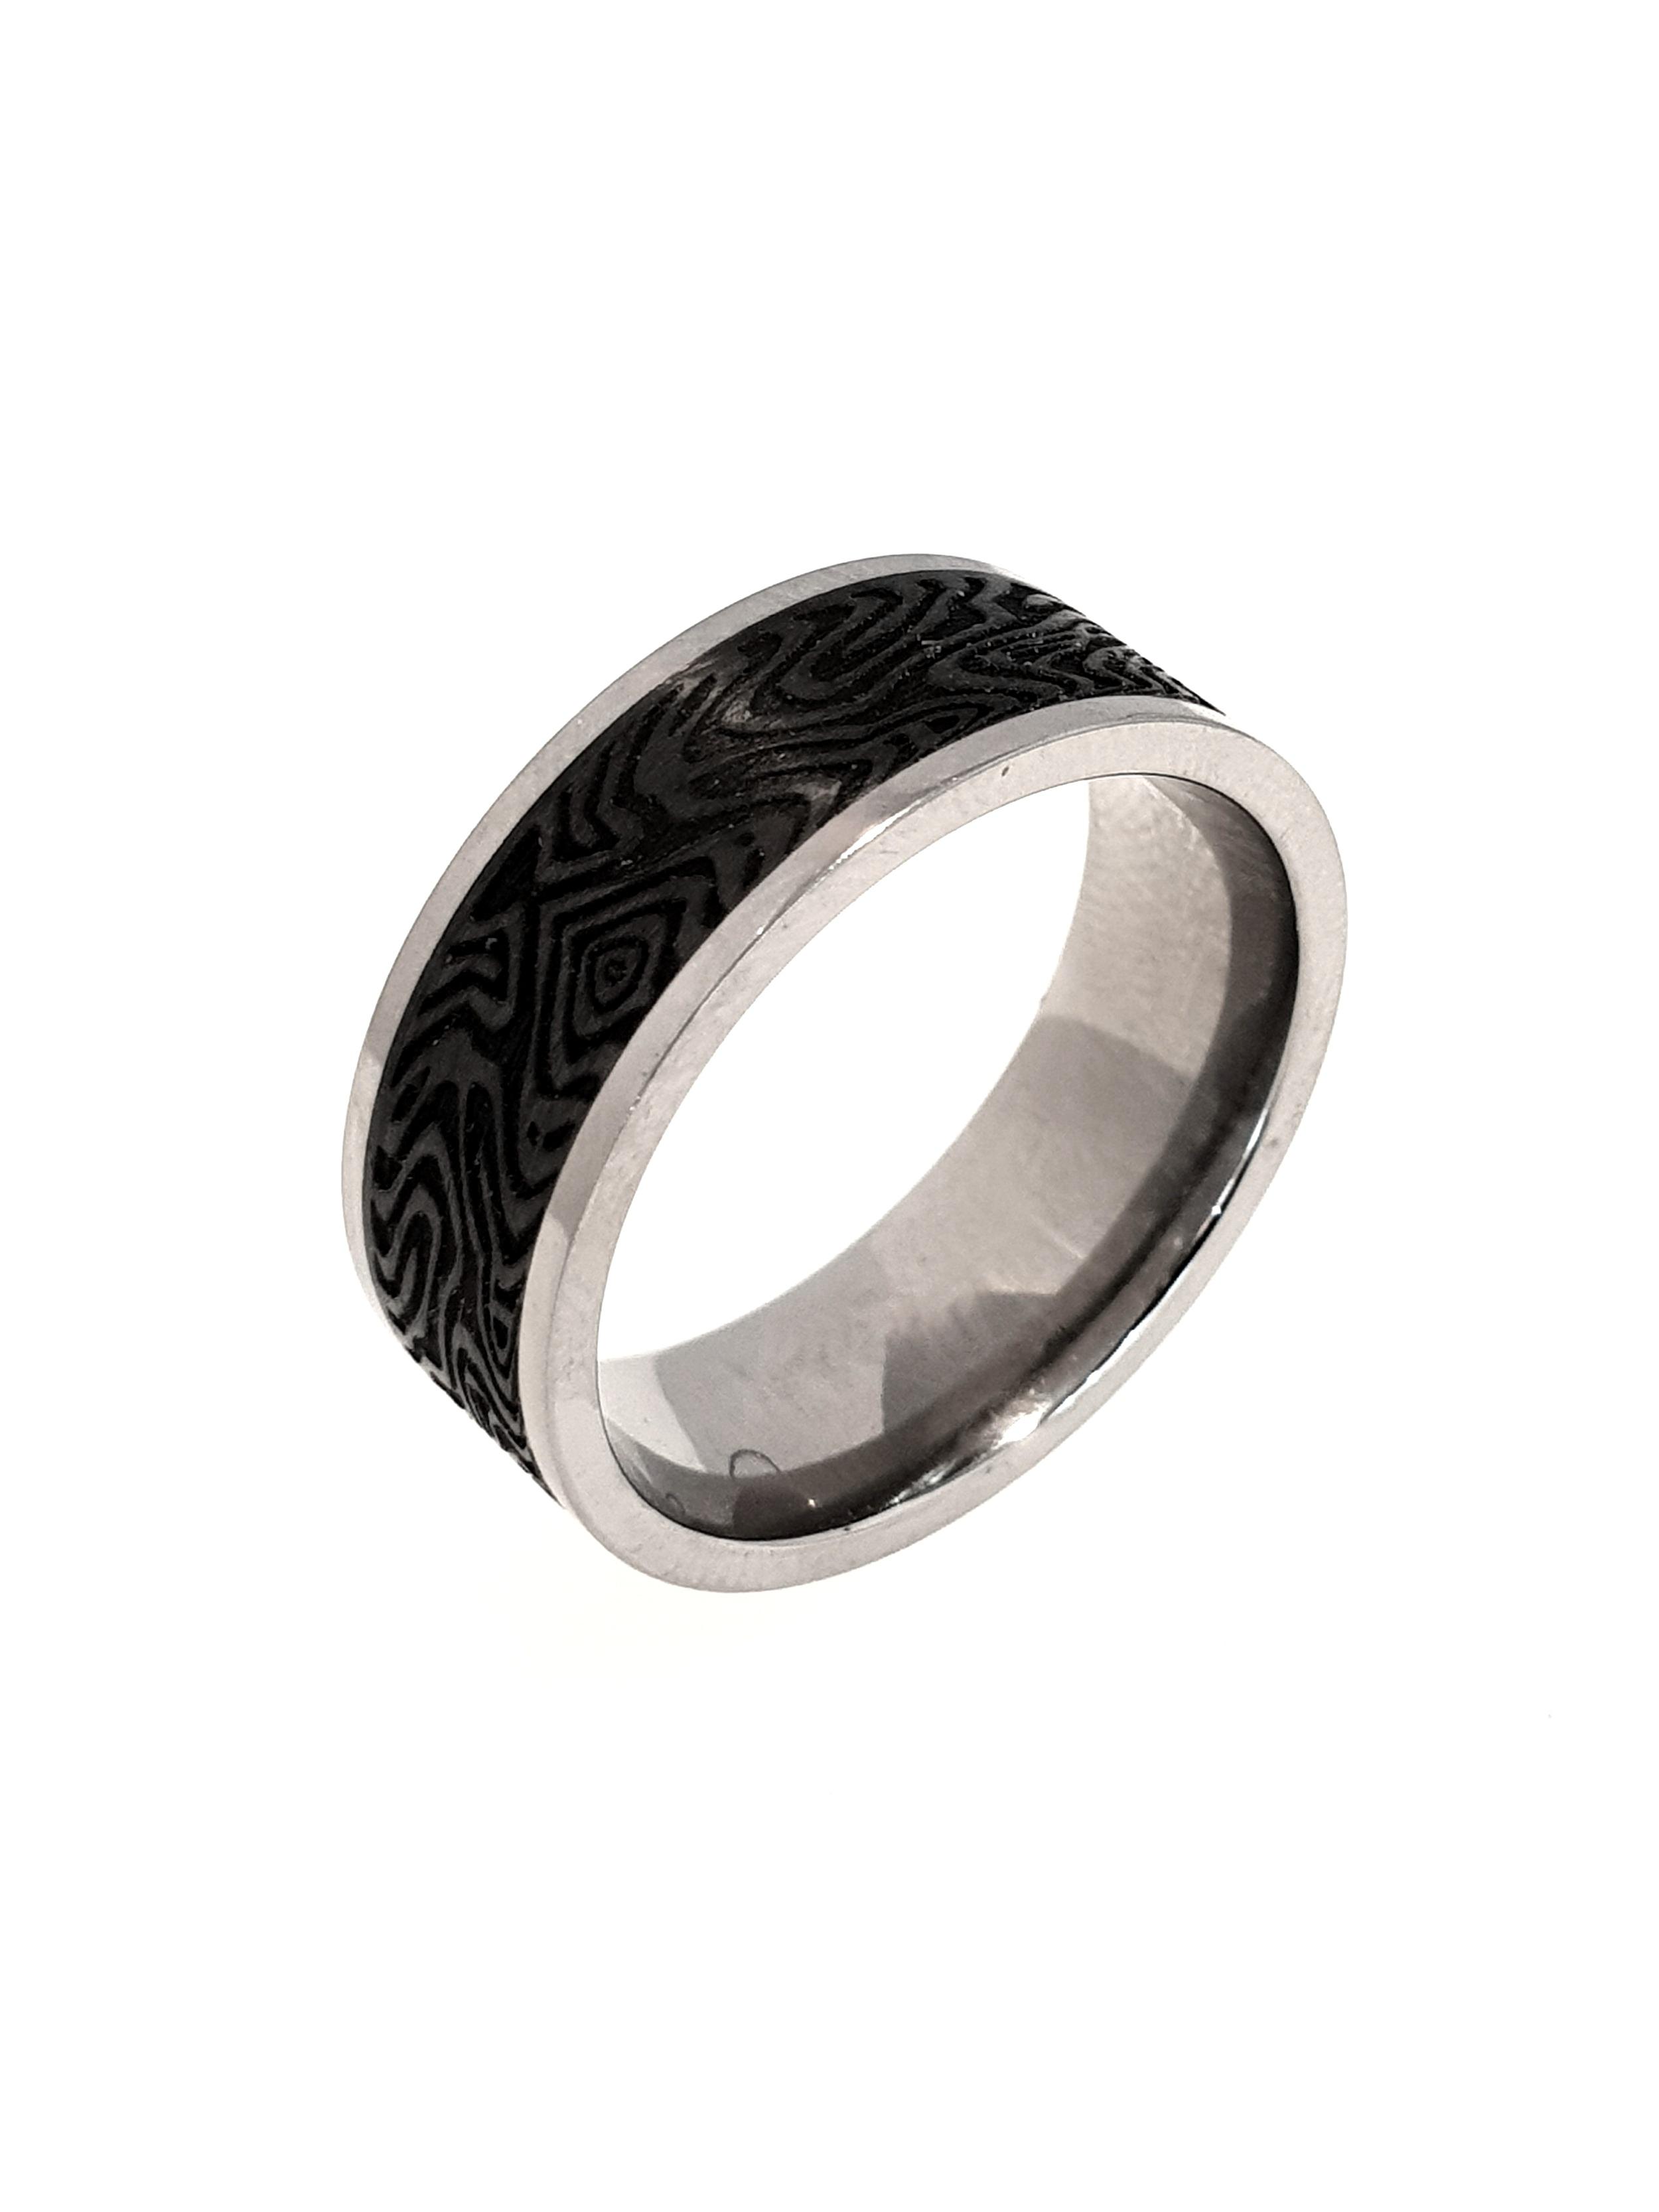 Carbon Fibre & Titanium Ring    Titan Factory (Model: 52463/000/000/2050)   Current Stock Size: T  Stock Code: E9811  £140